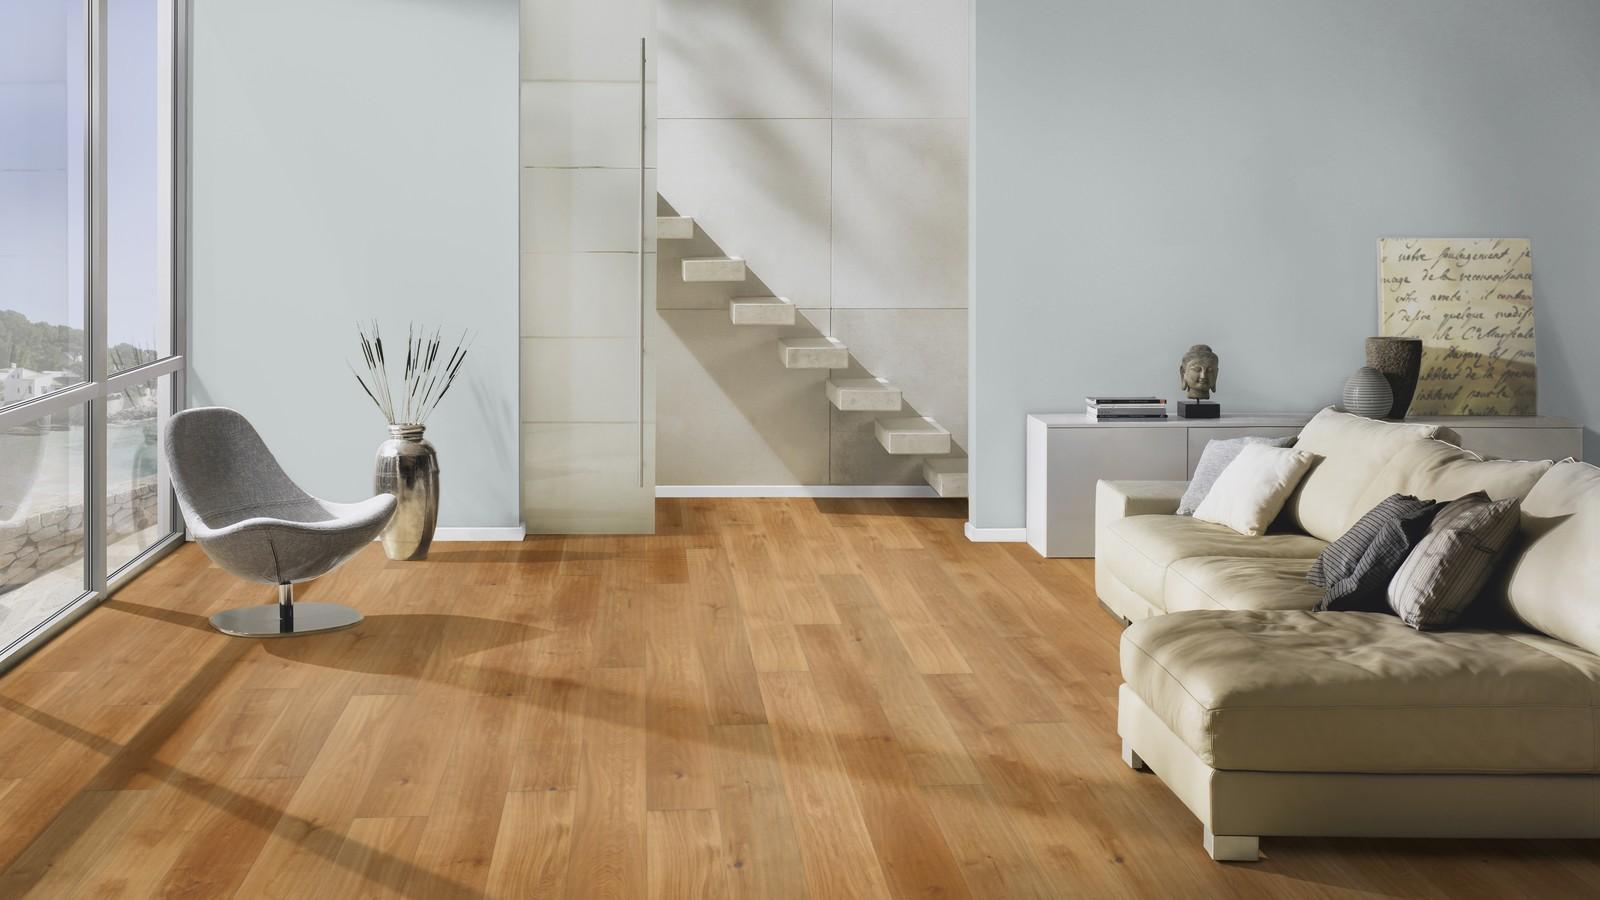 ter h rne bright collection l parkett l b13 eiche alpin l landhausdiele preisbrecher. Black Bedroom Furniture Sets. Home Design Ideas